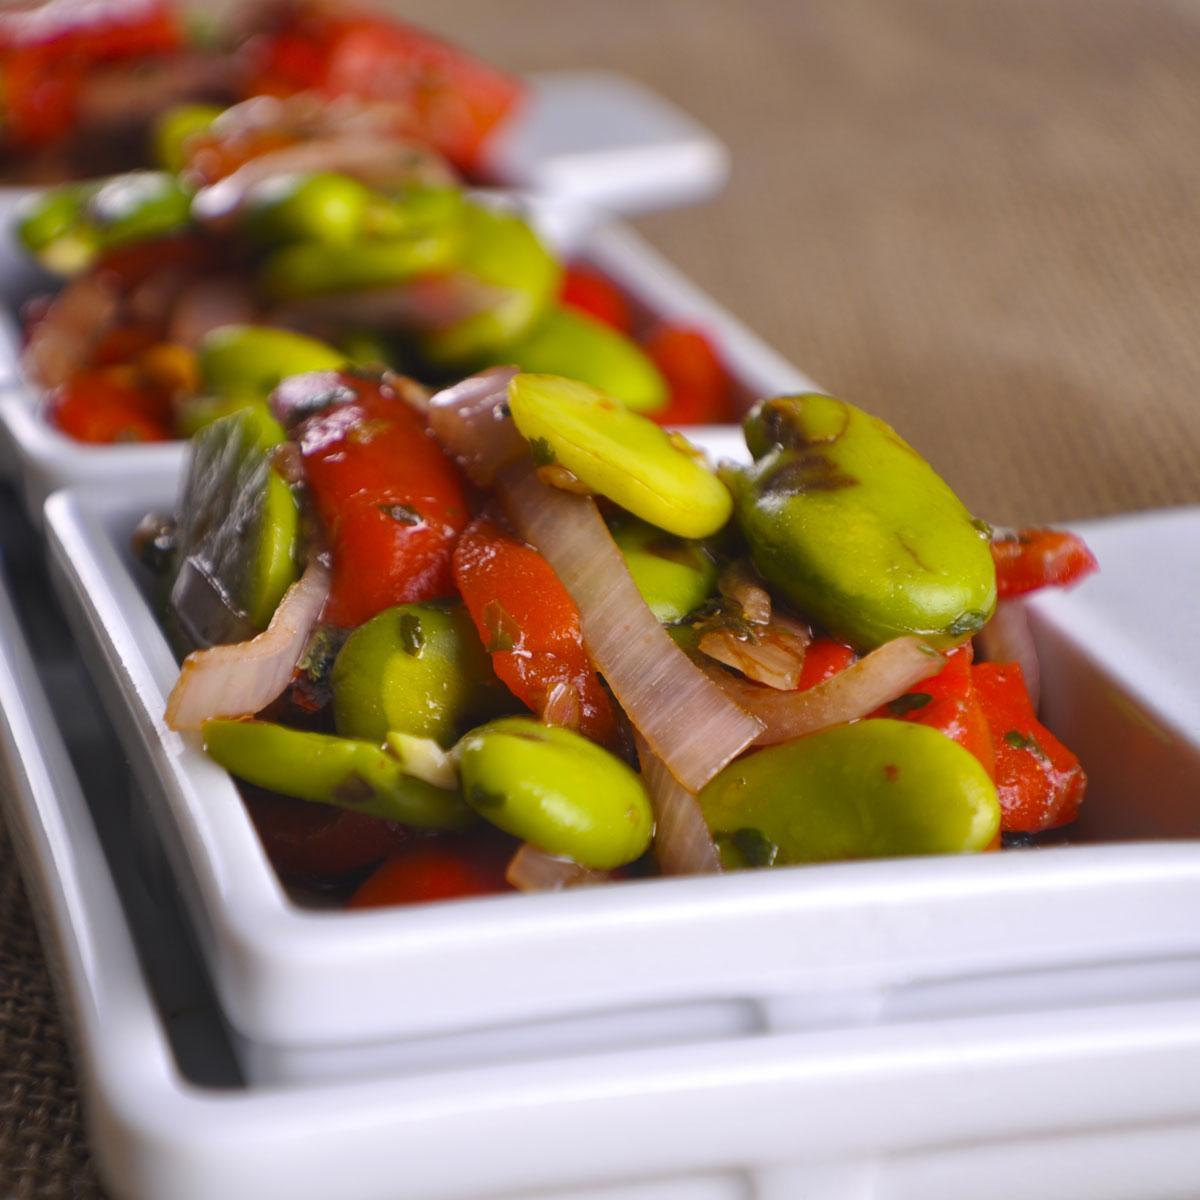 recette salade de f ves au poivron cuisine madame figaro. Black Bedroom Furniture Sets. Home Design Ideas